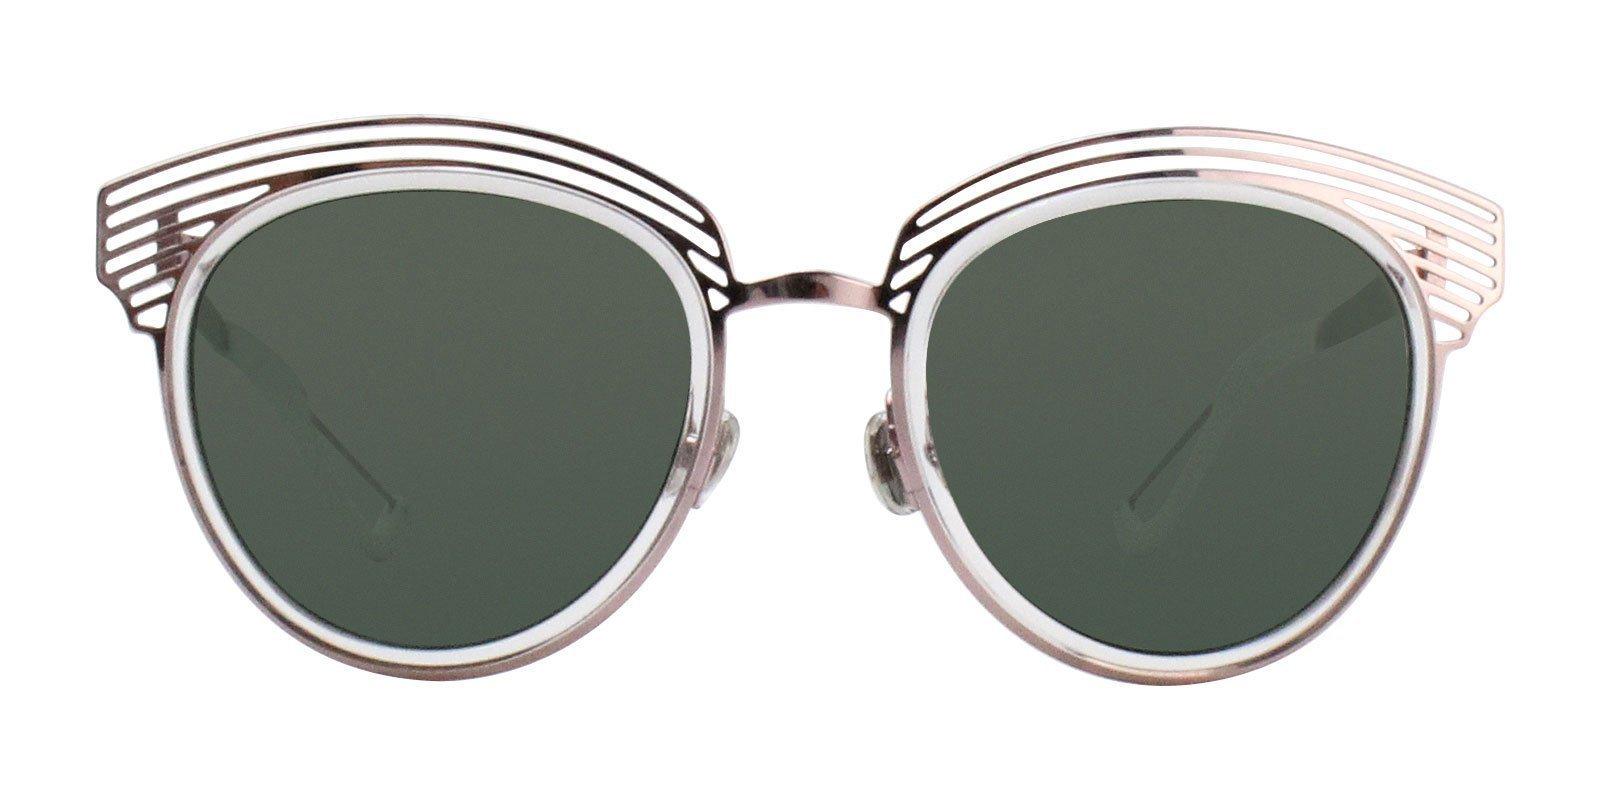 9535b0883d Dior - Enigme Pink - Gray Sunglasses ในปี 2019